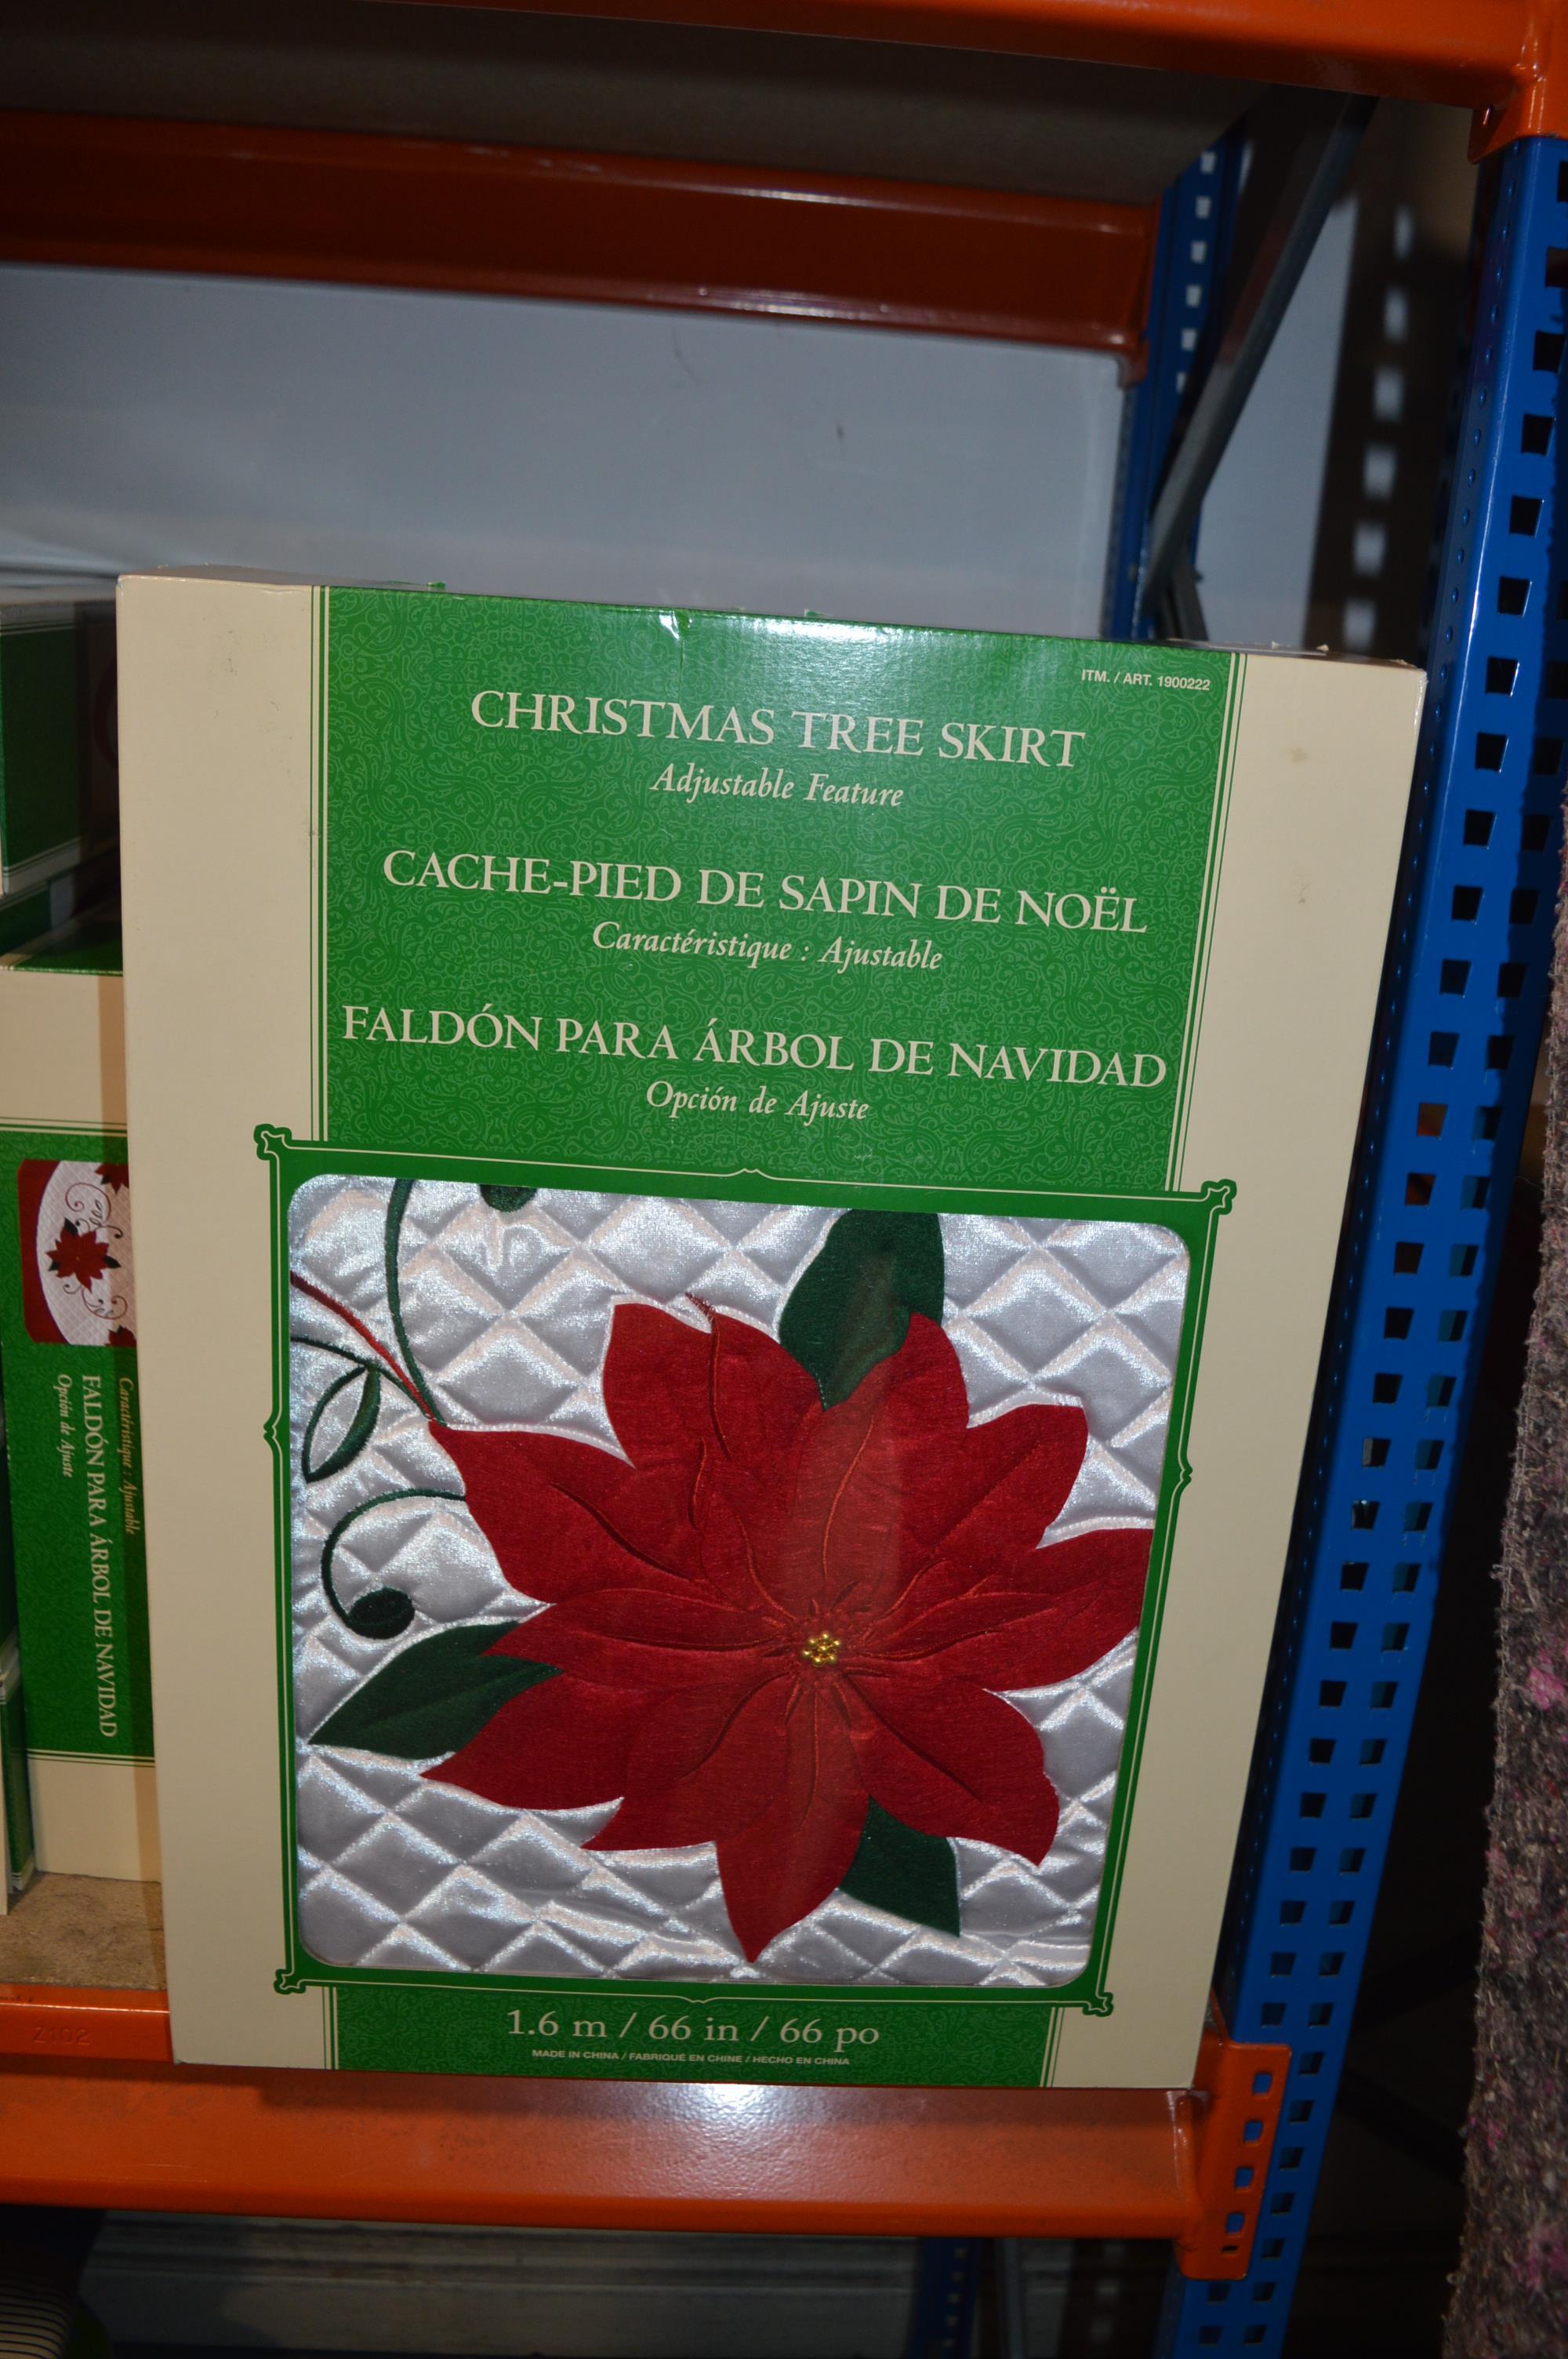 Lot 23 - *Christmas Tree Skirt 1.6m